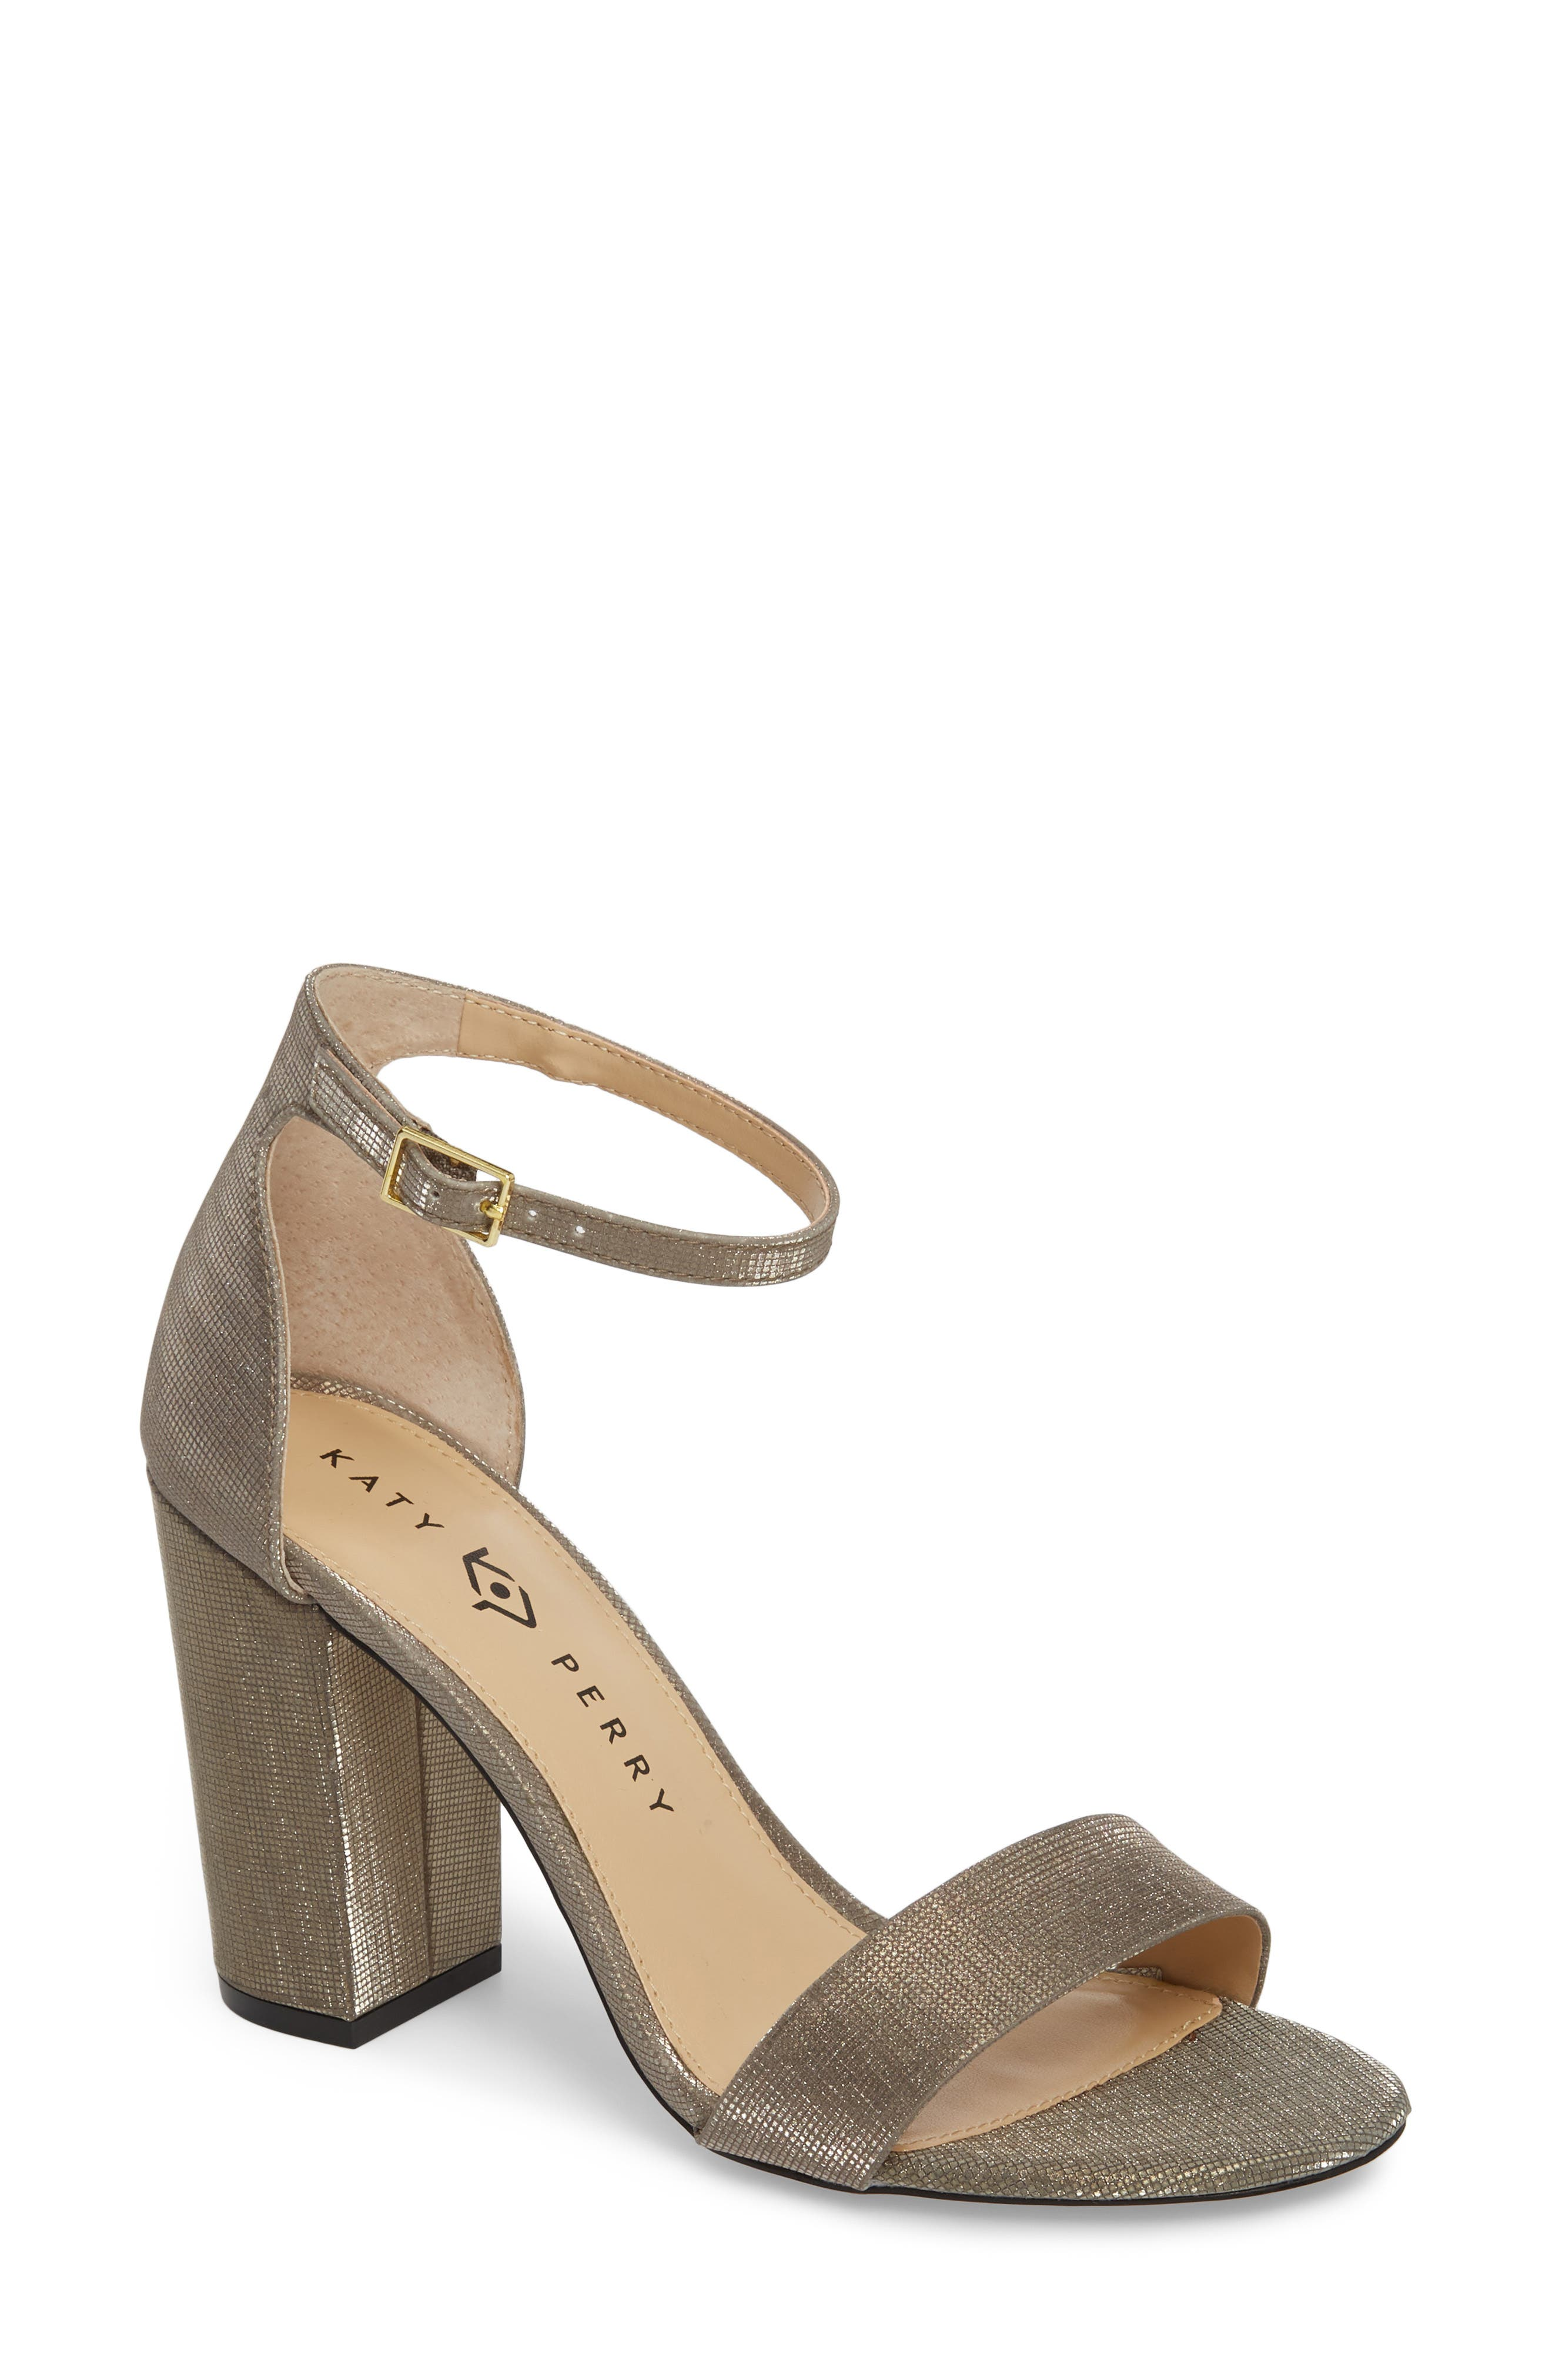 Katy Perry Ankle Strap Sandal (Women)